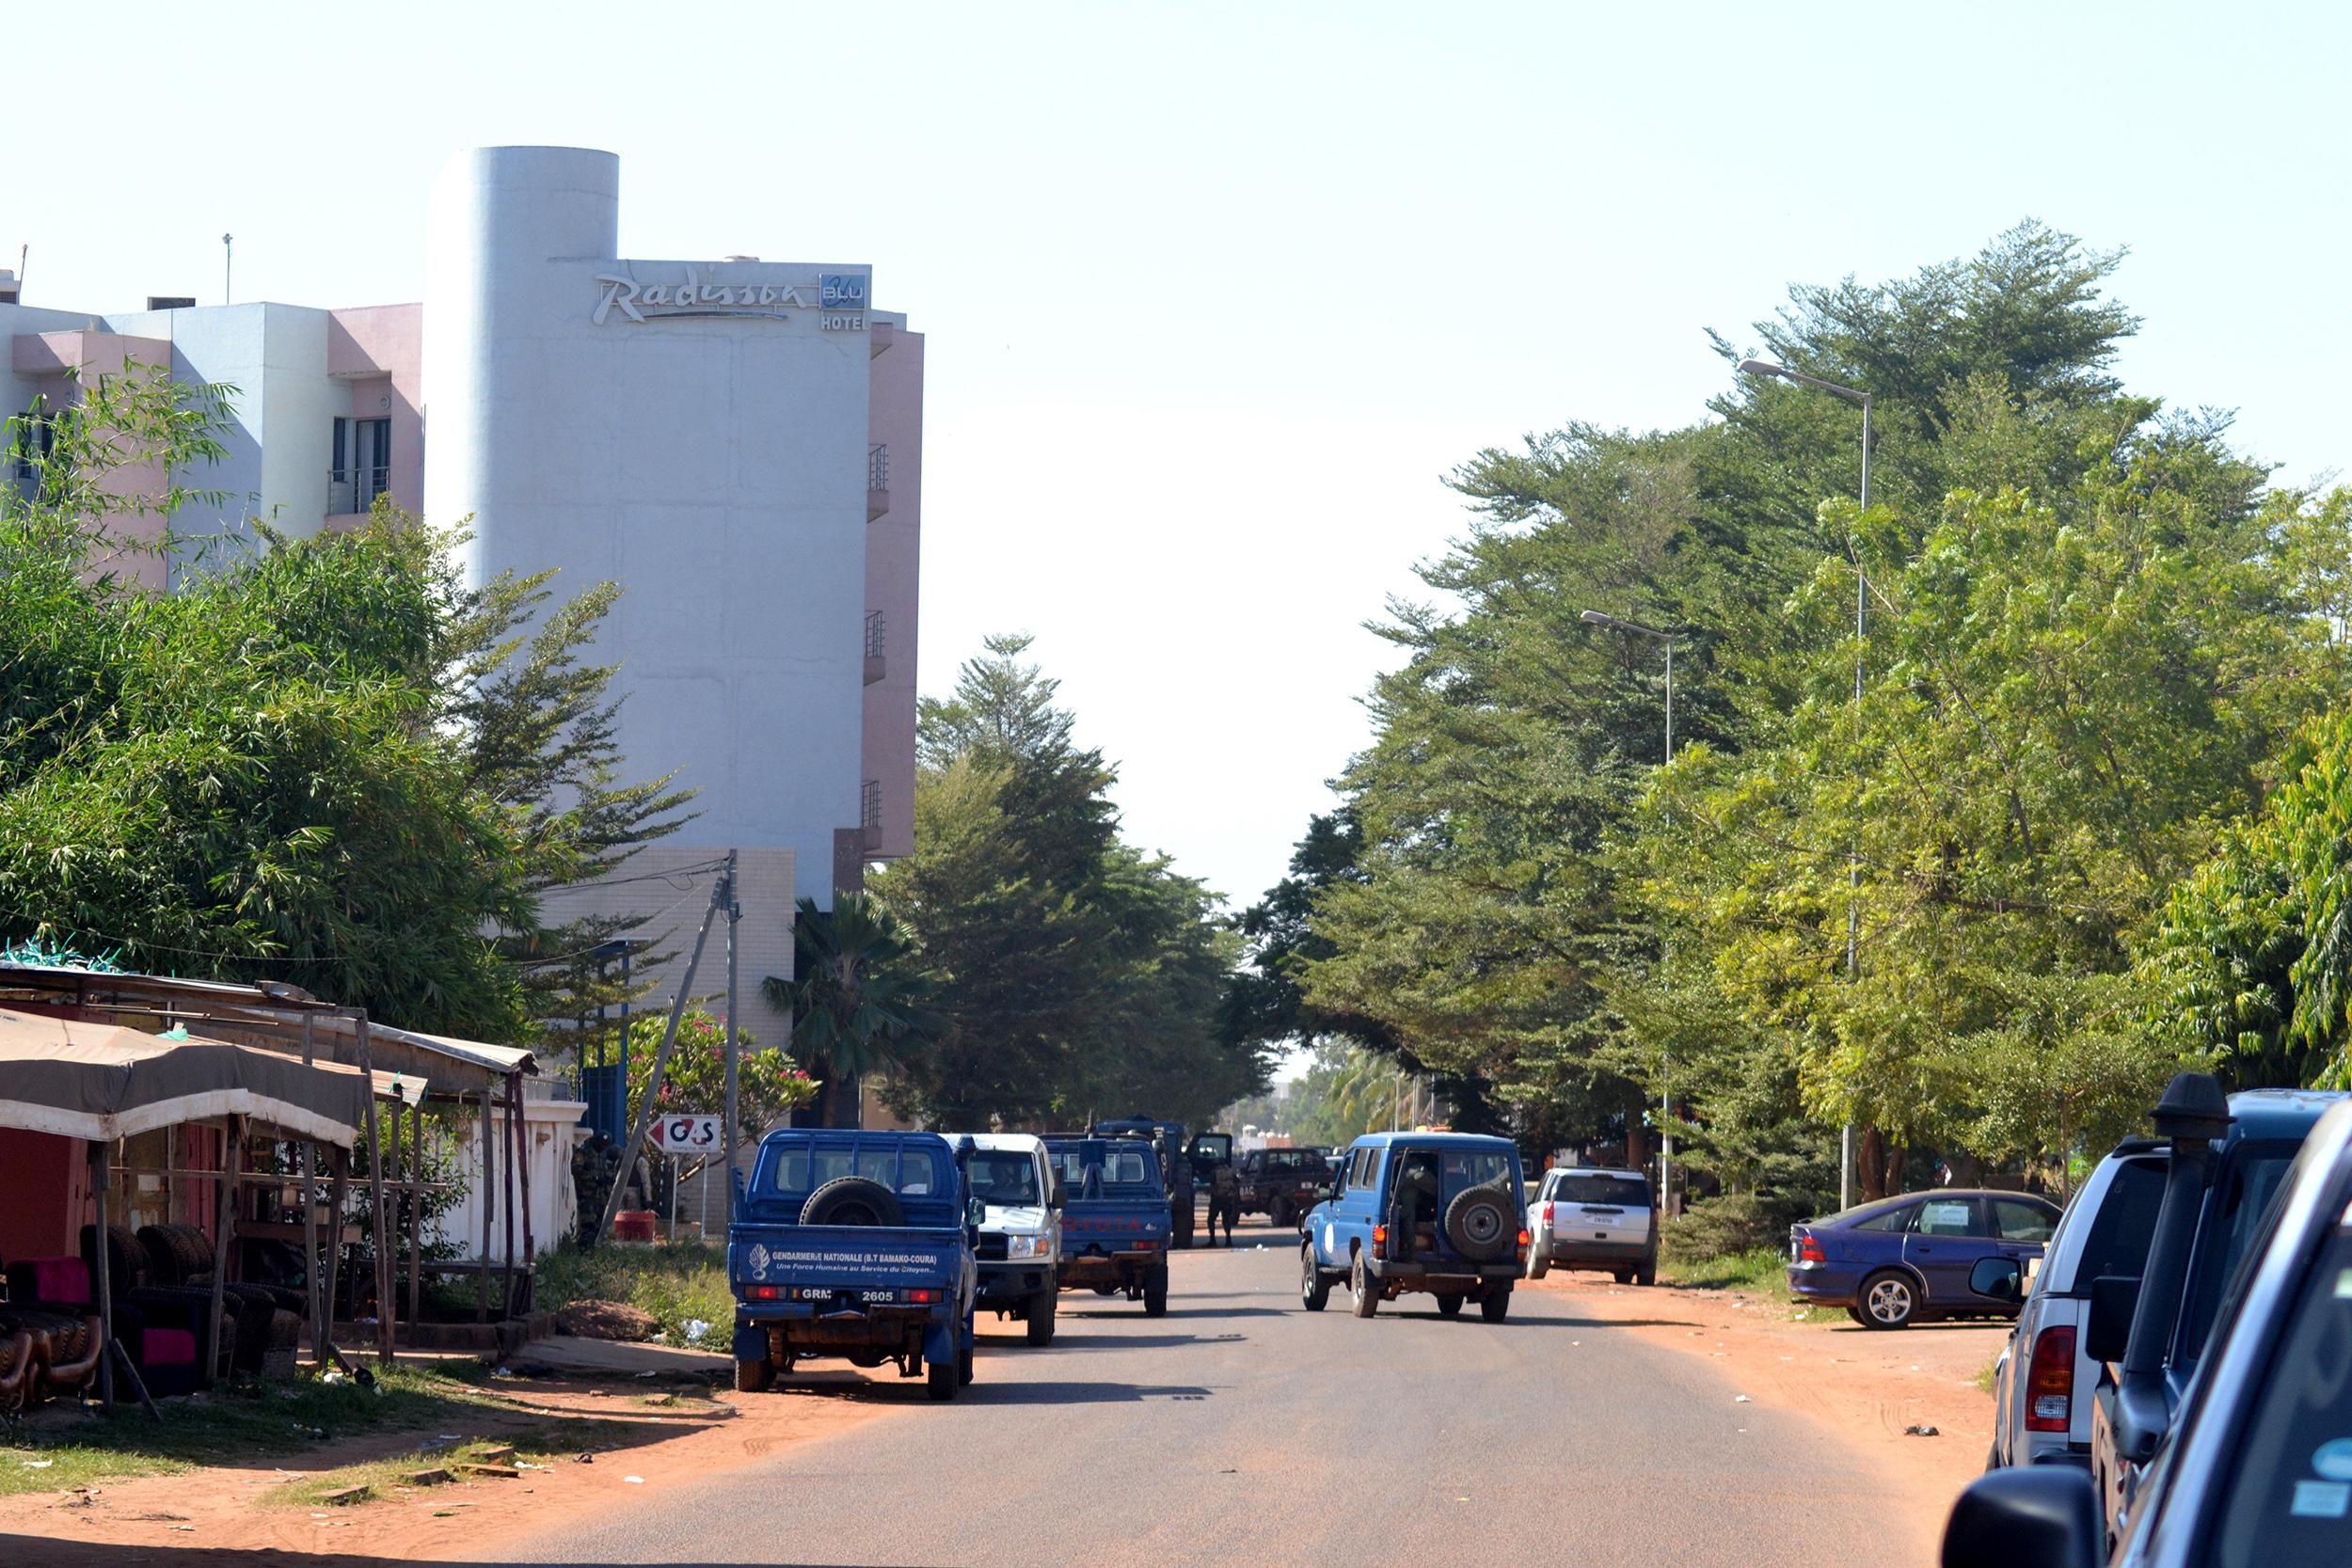 The Radisson Blu Hotel in Mali's capital Bamako on Nov 20, 2015.